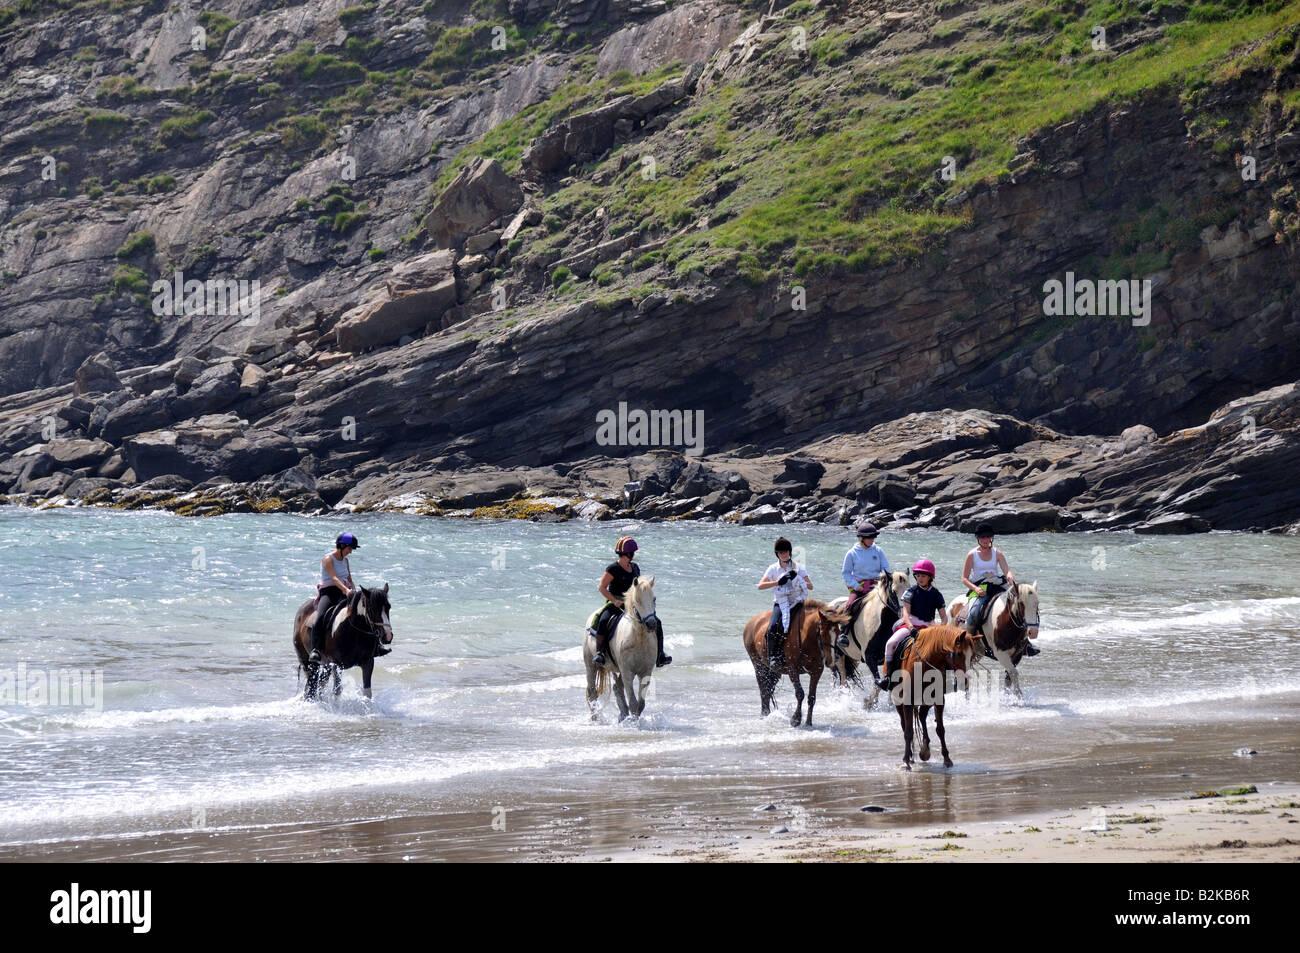 Horse riding on Little Hven beach Pembrokeshire Wales Cymru - Stock Image